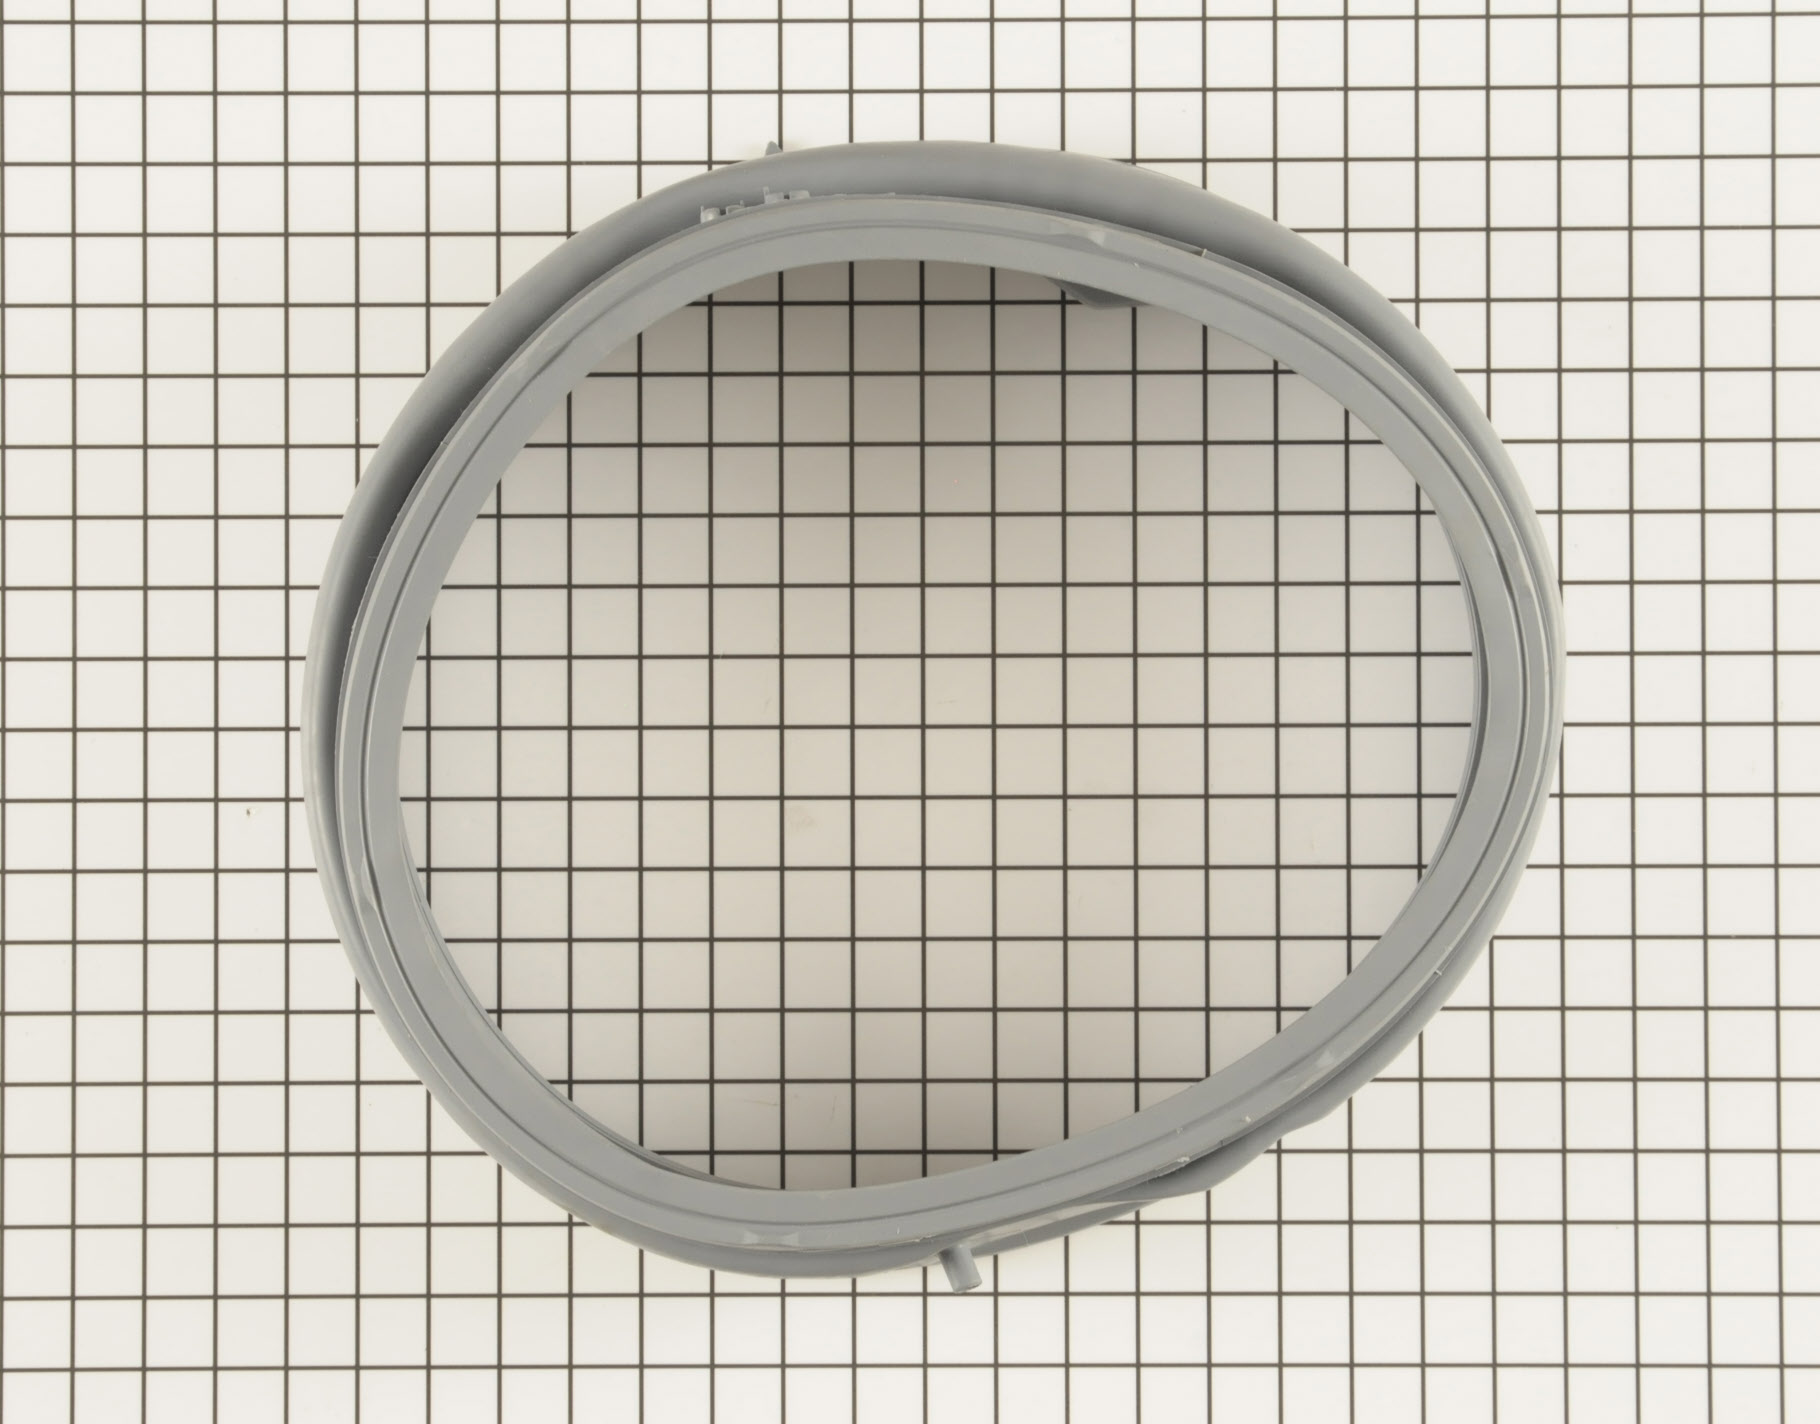 LG Washing Machine Part # 4986ER0006F - Door Boot Seal